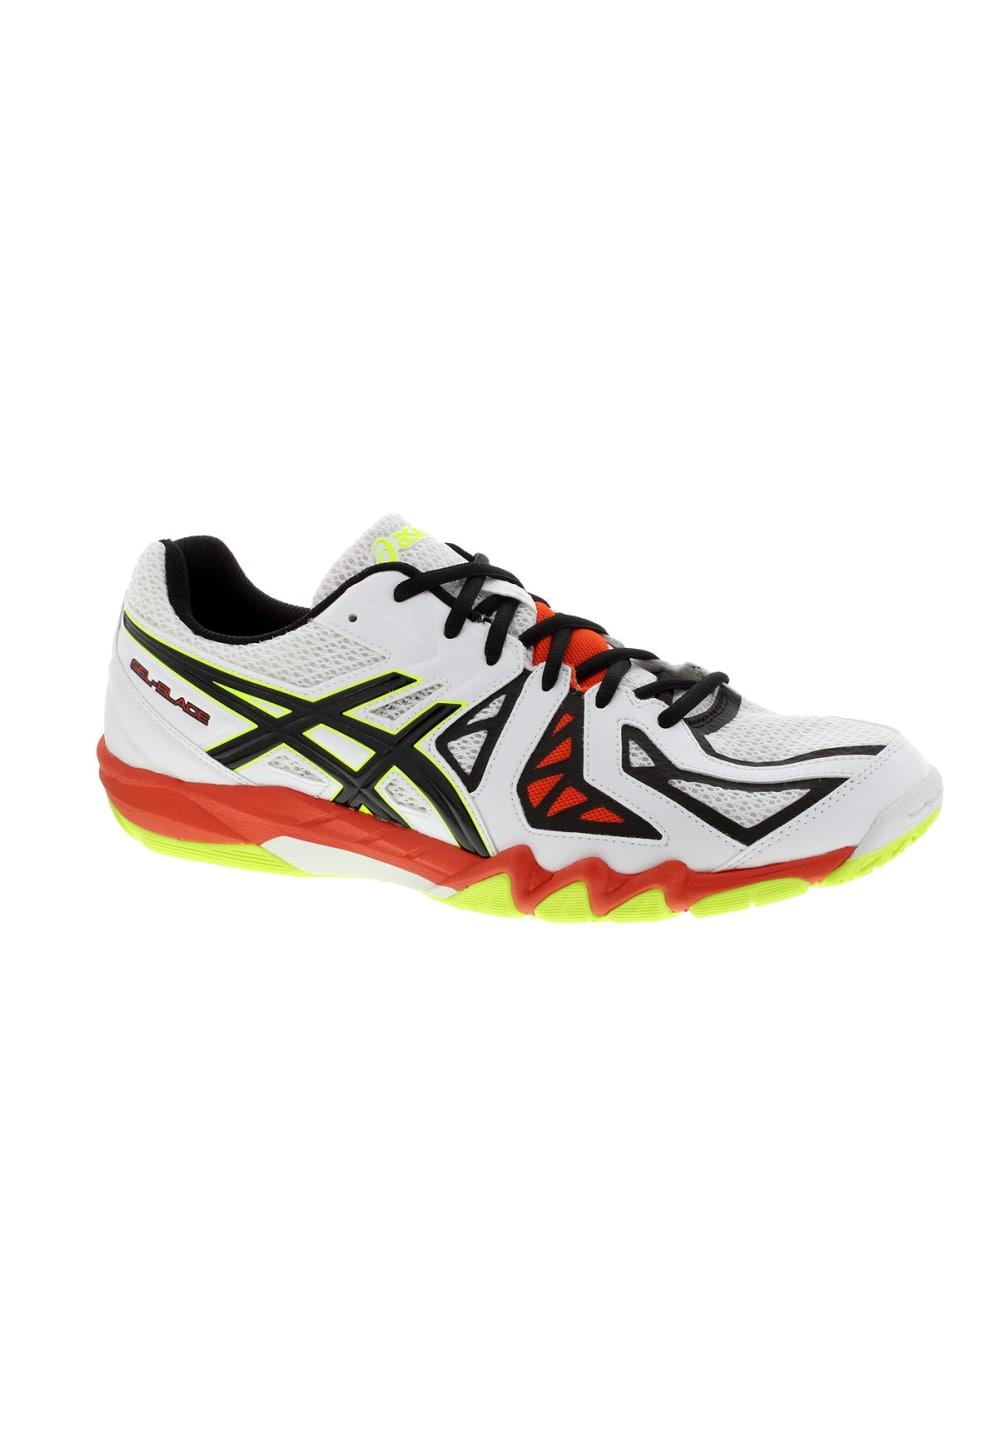 Blanc Homme En 5 Blade Asics Salle Sports Chaussures Gel Pour fzwg8qvP